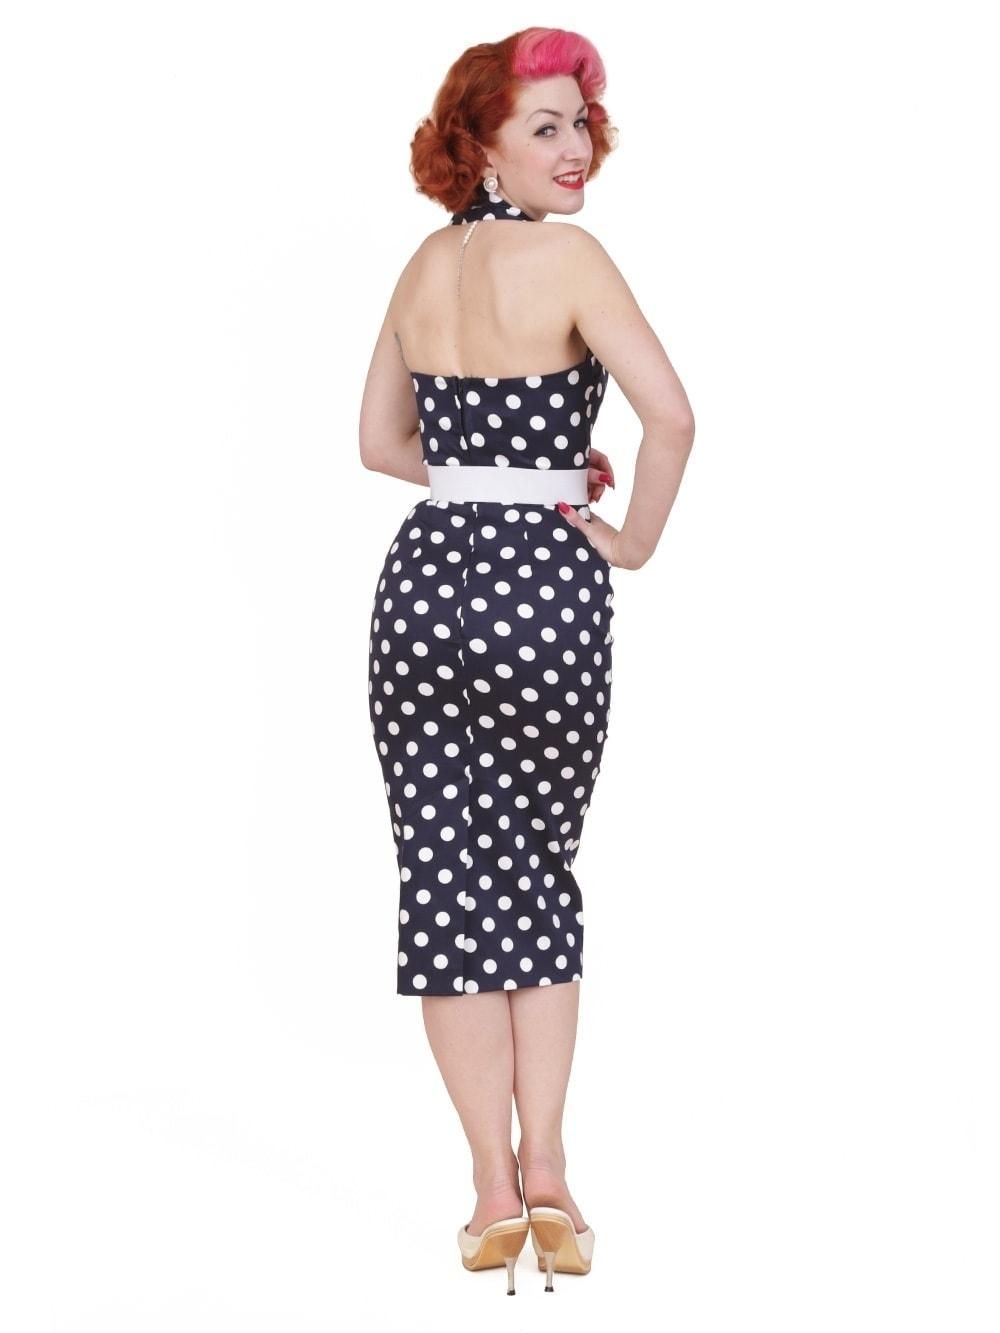 448a2f858b3e0 1950s Halterneck Pencil Navy Polkadot Dress from Vivien of Holloway